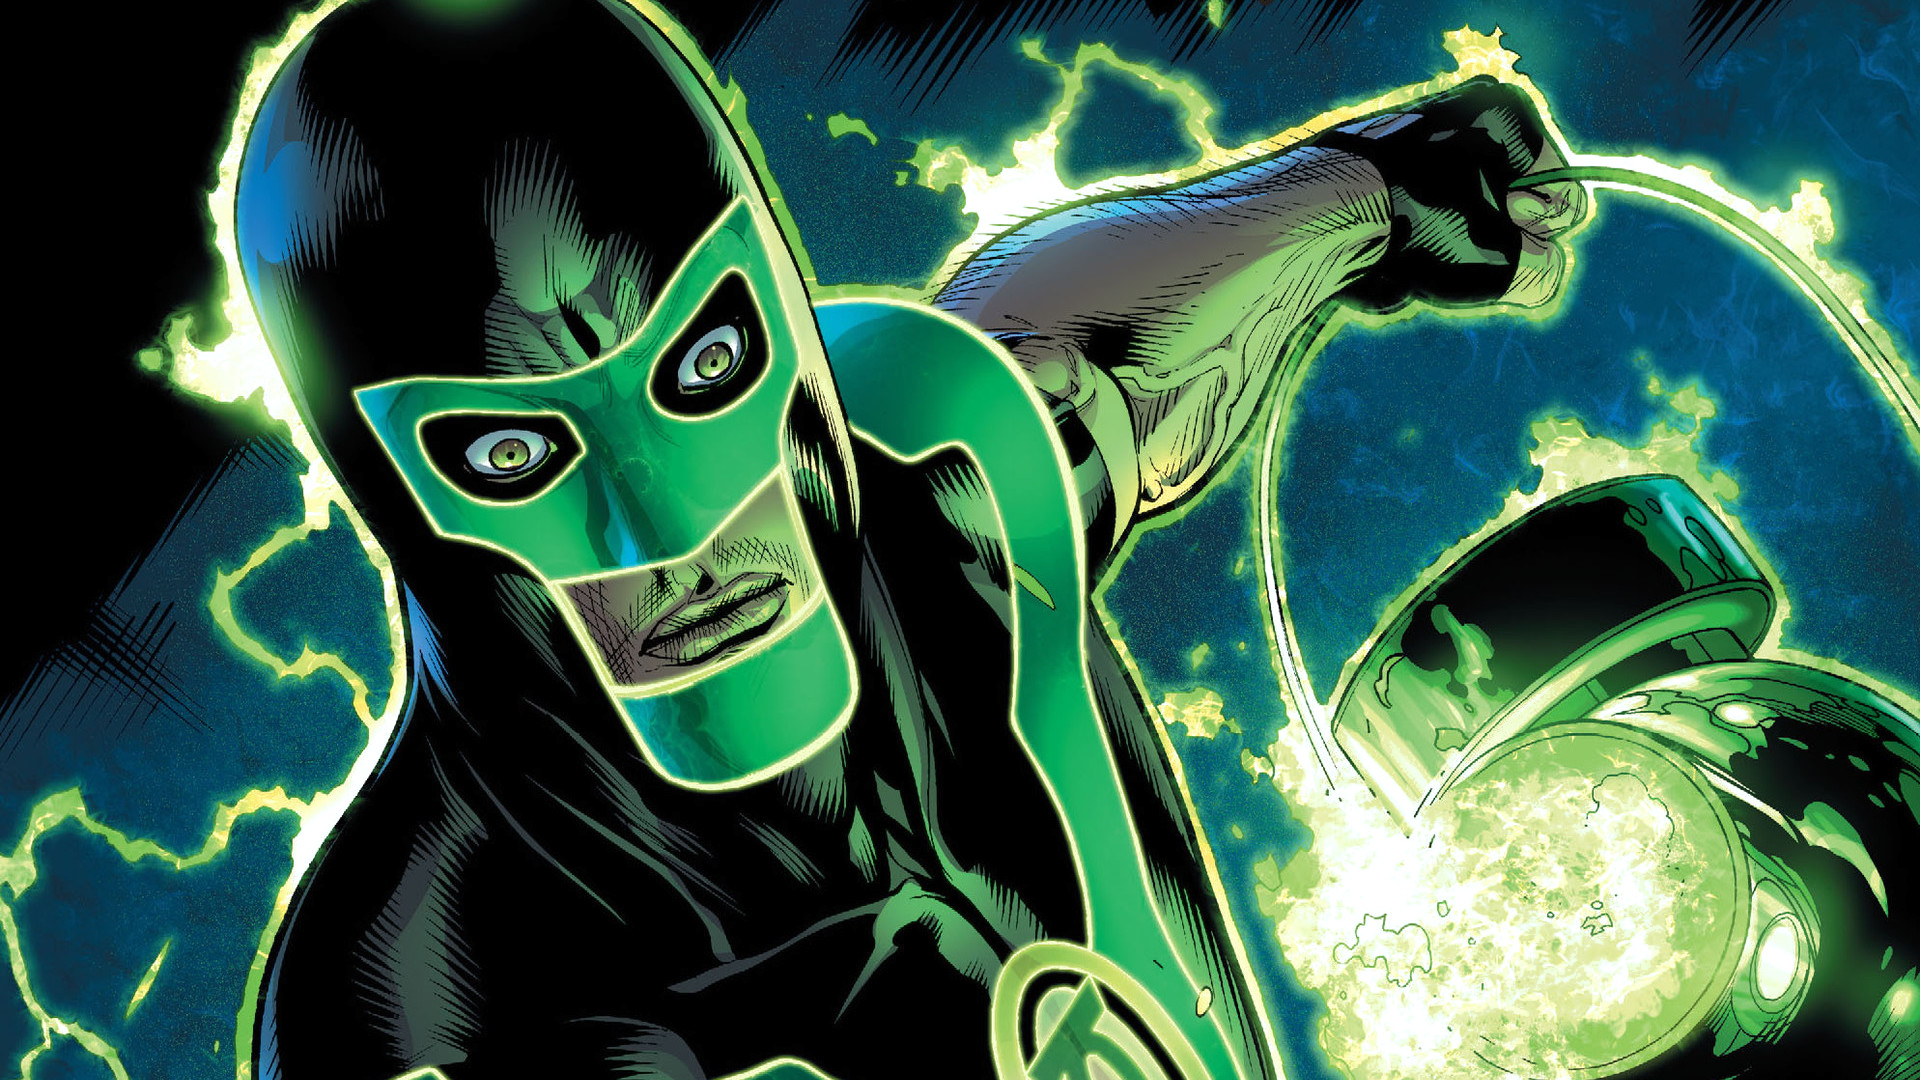 Green Lantern Comic Wallpaper: Green Lantern Oath Wallpaper (68+ Images